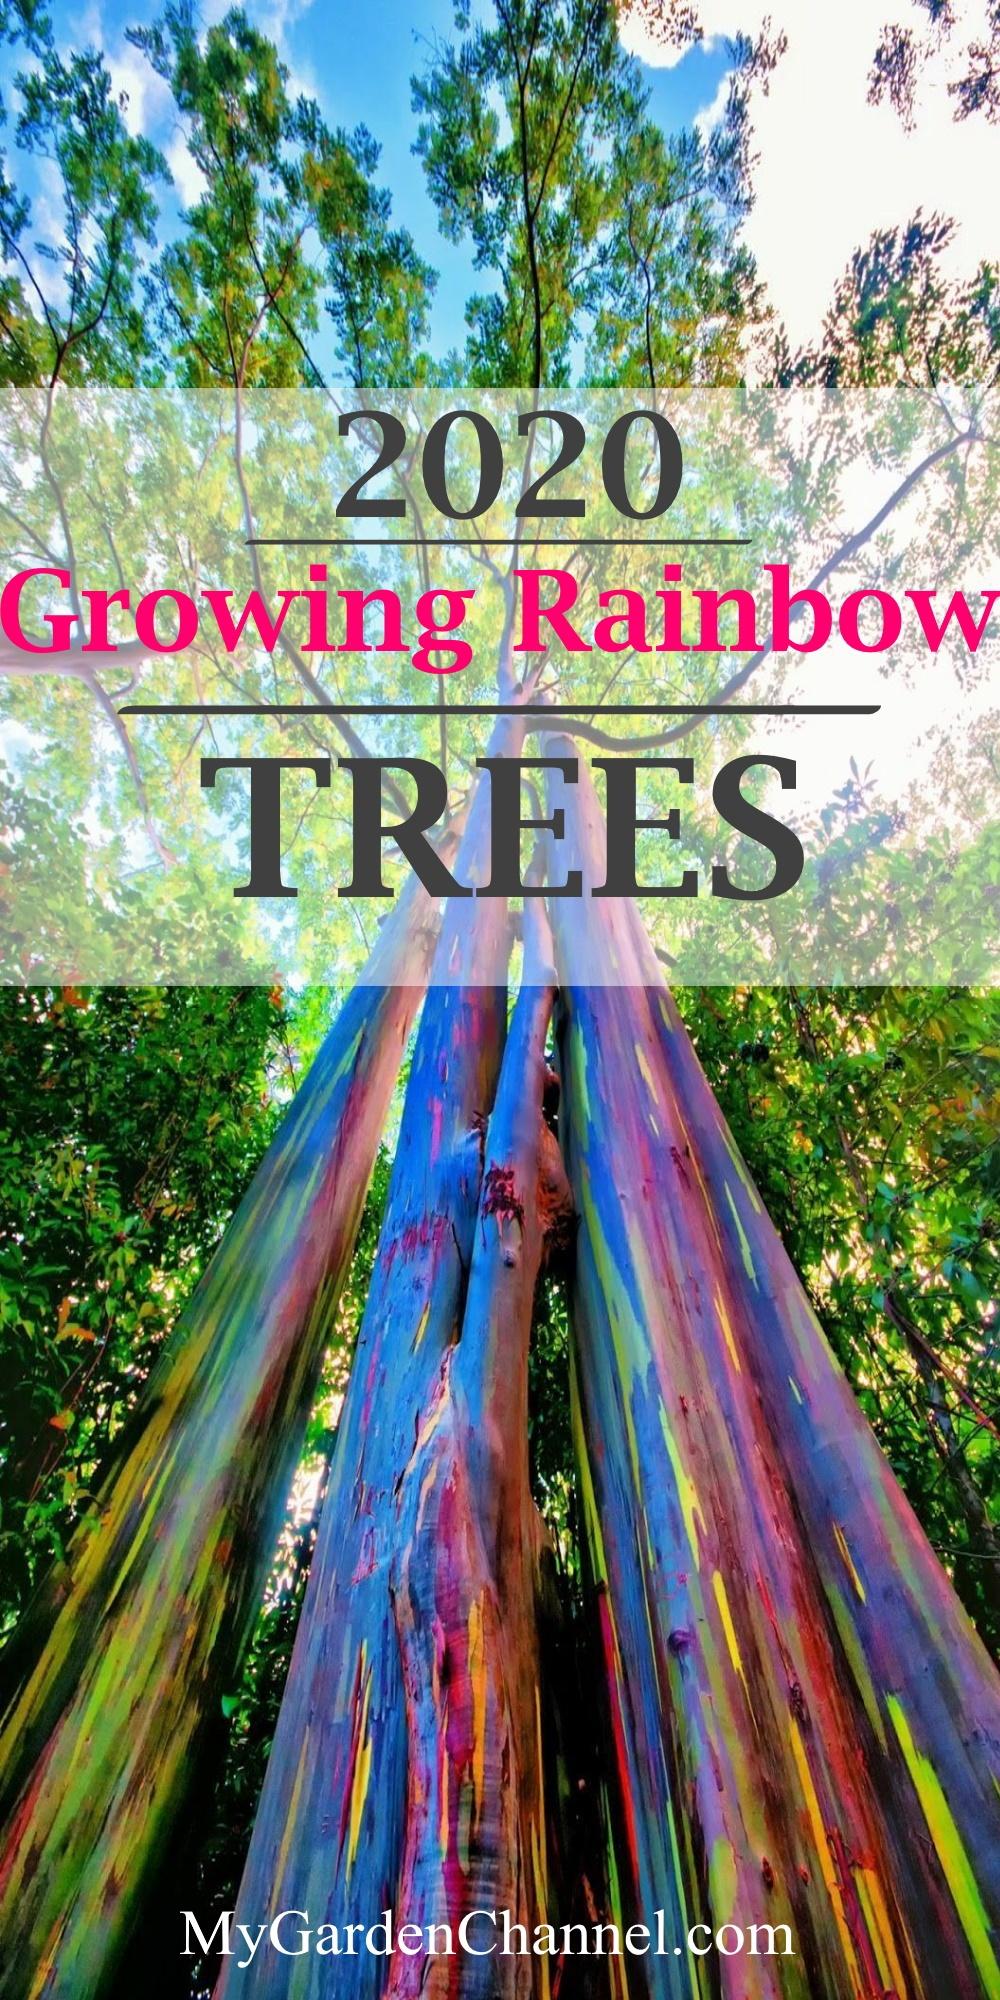 Growing Rainbow Trees is Amazing